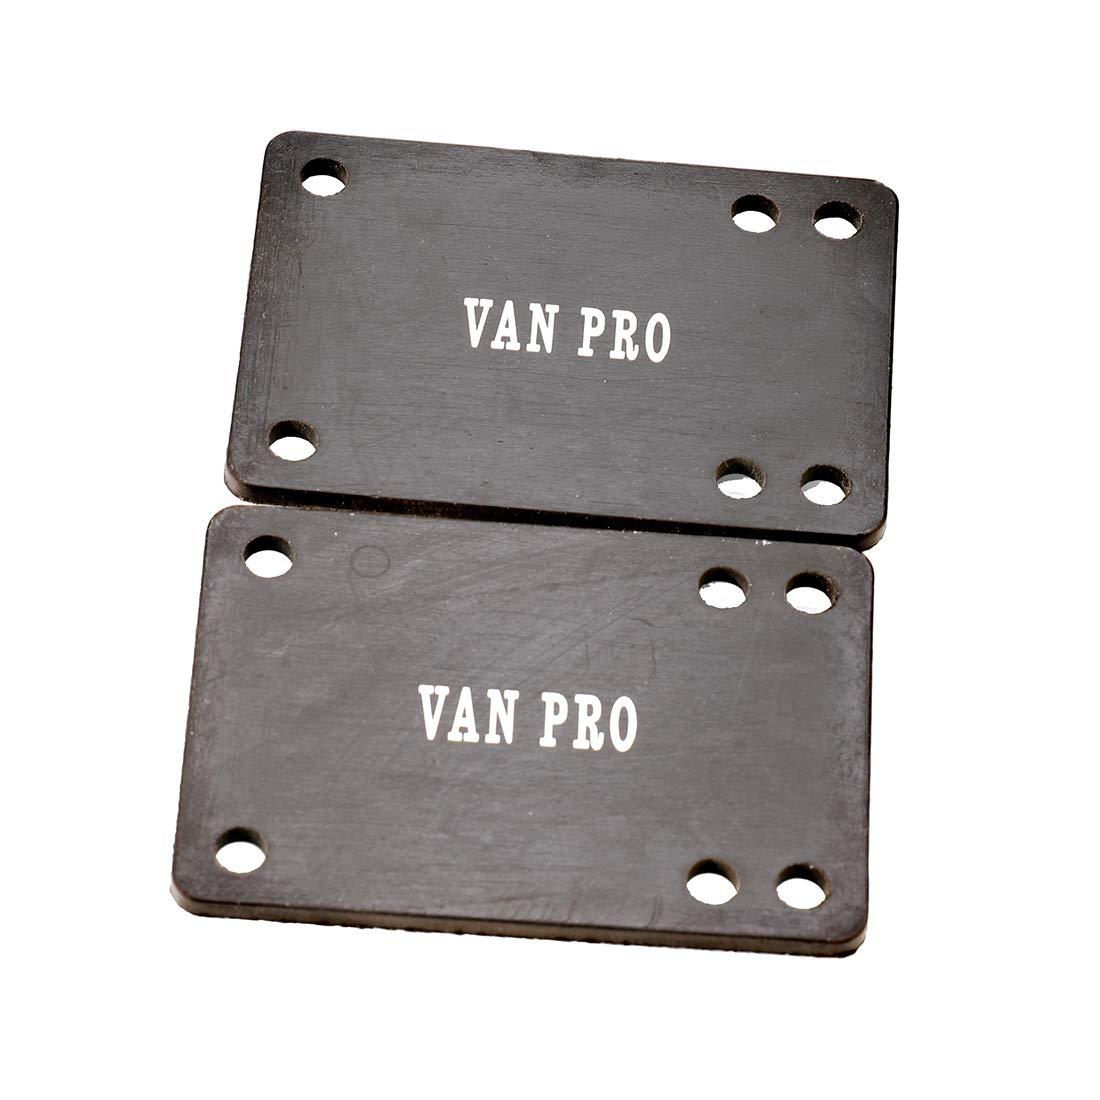 vanpro Skateboard Preventing Wheelbite Vibrations